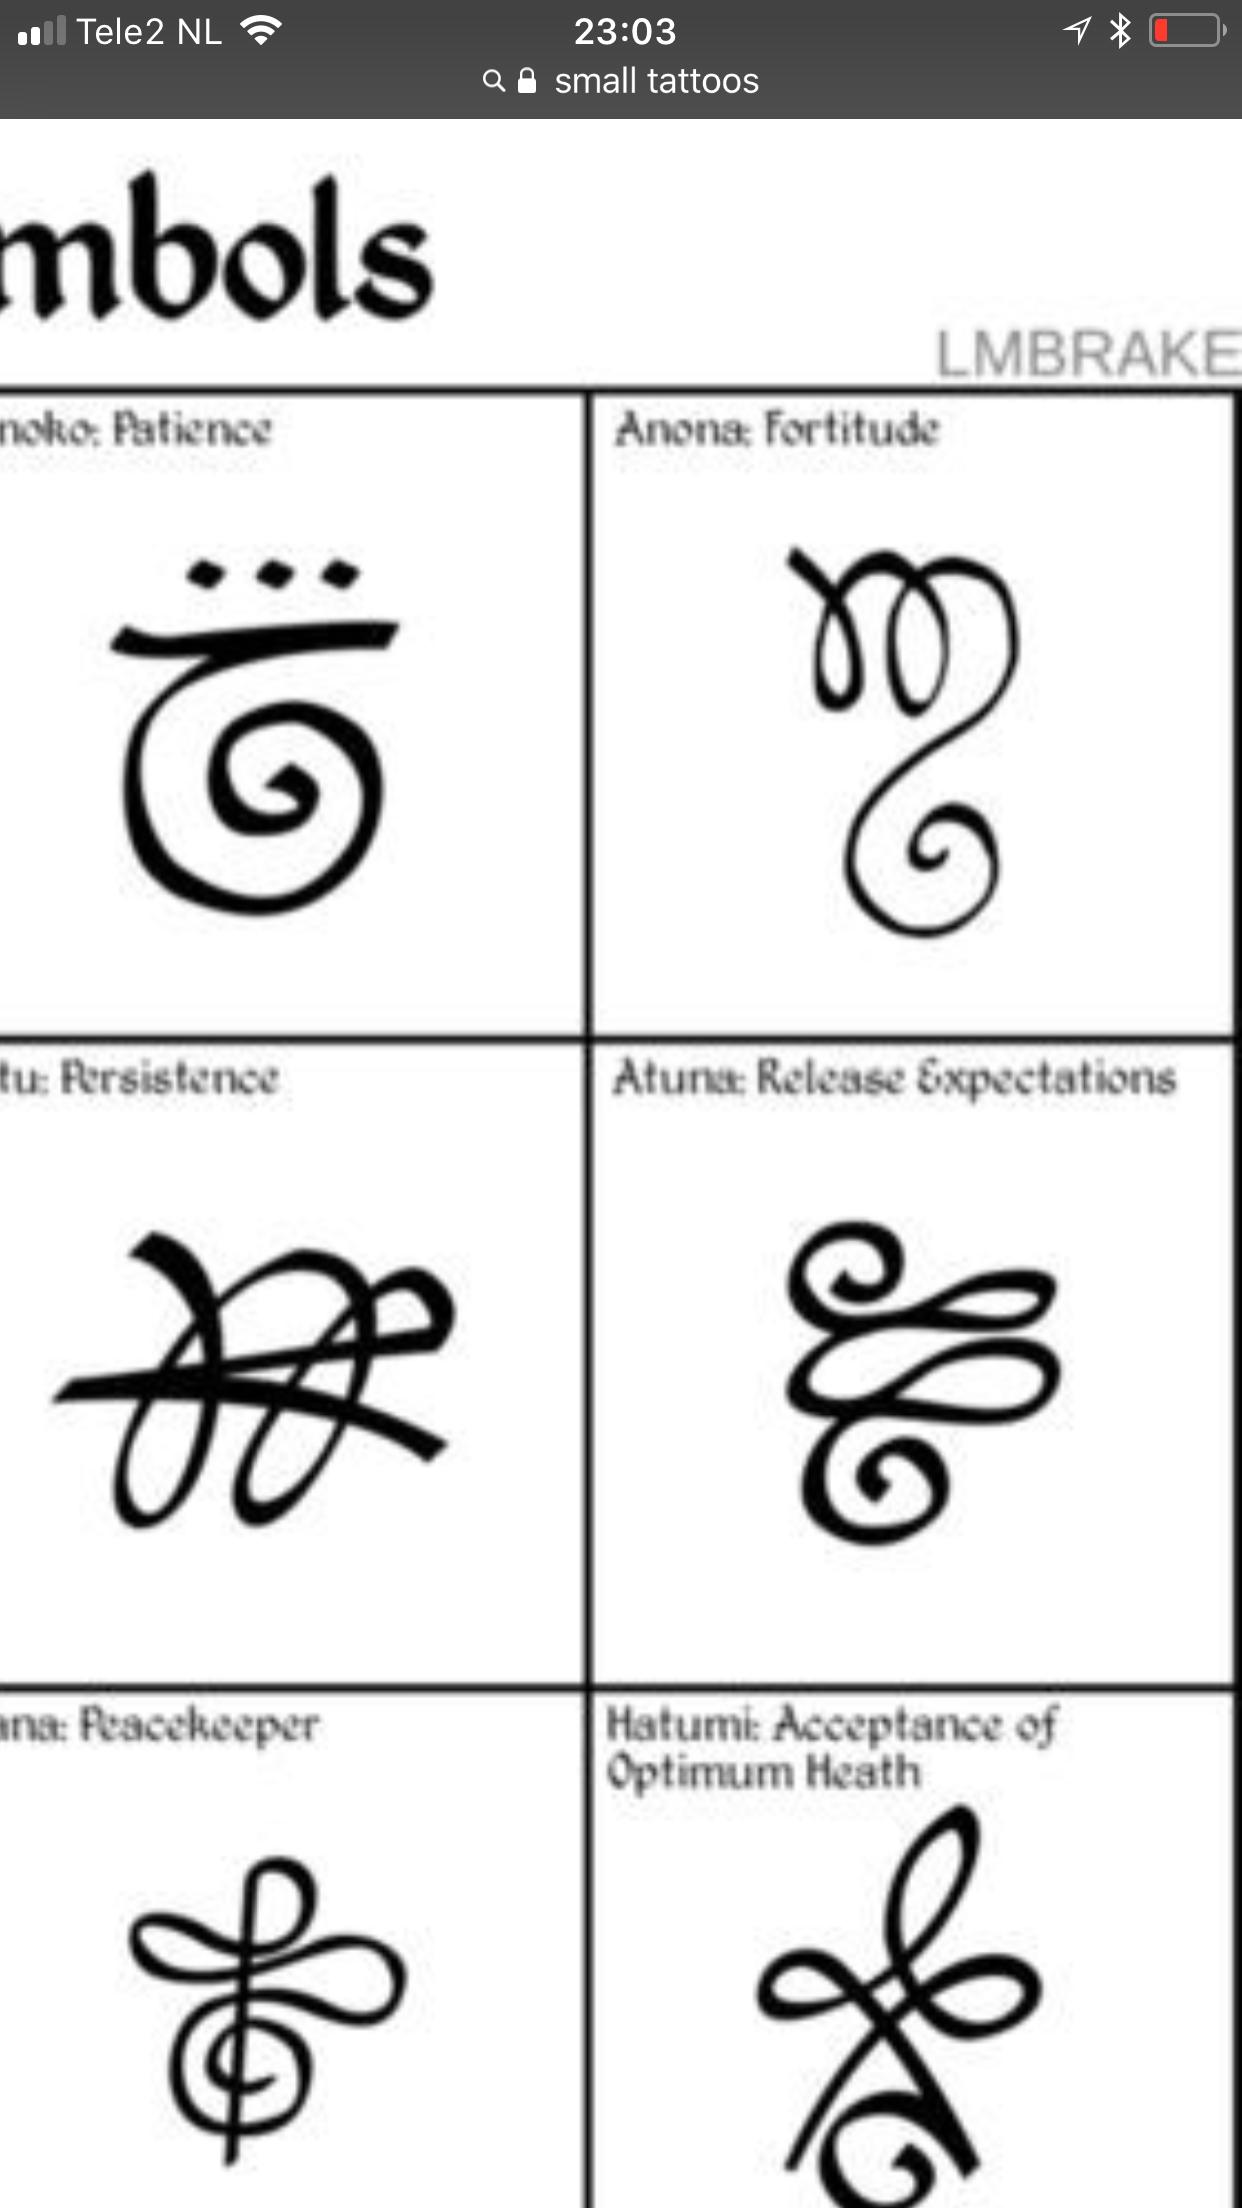 Fortitude Persistence Symbolic Tattoos Small Tattoos Tattoos